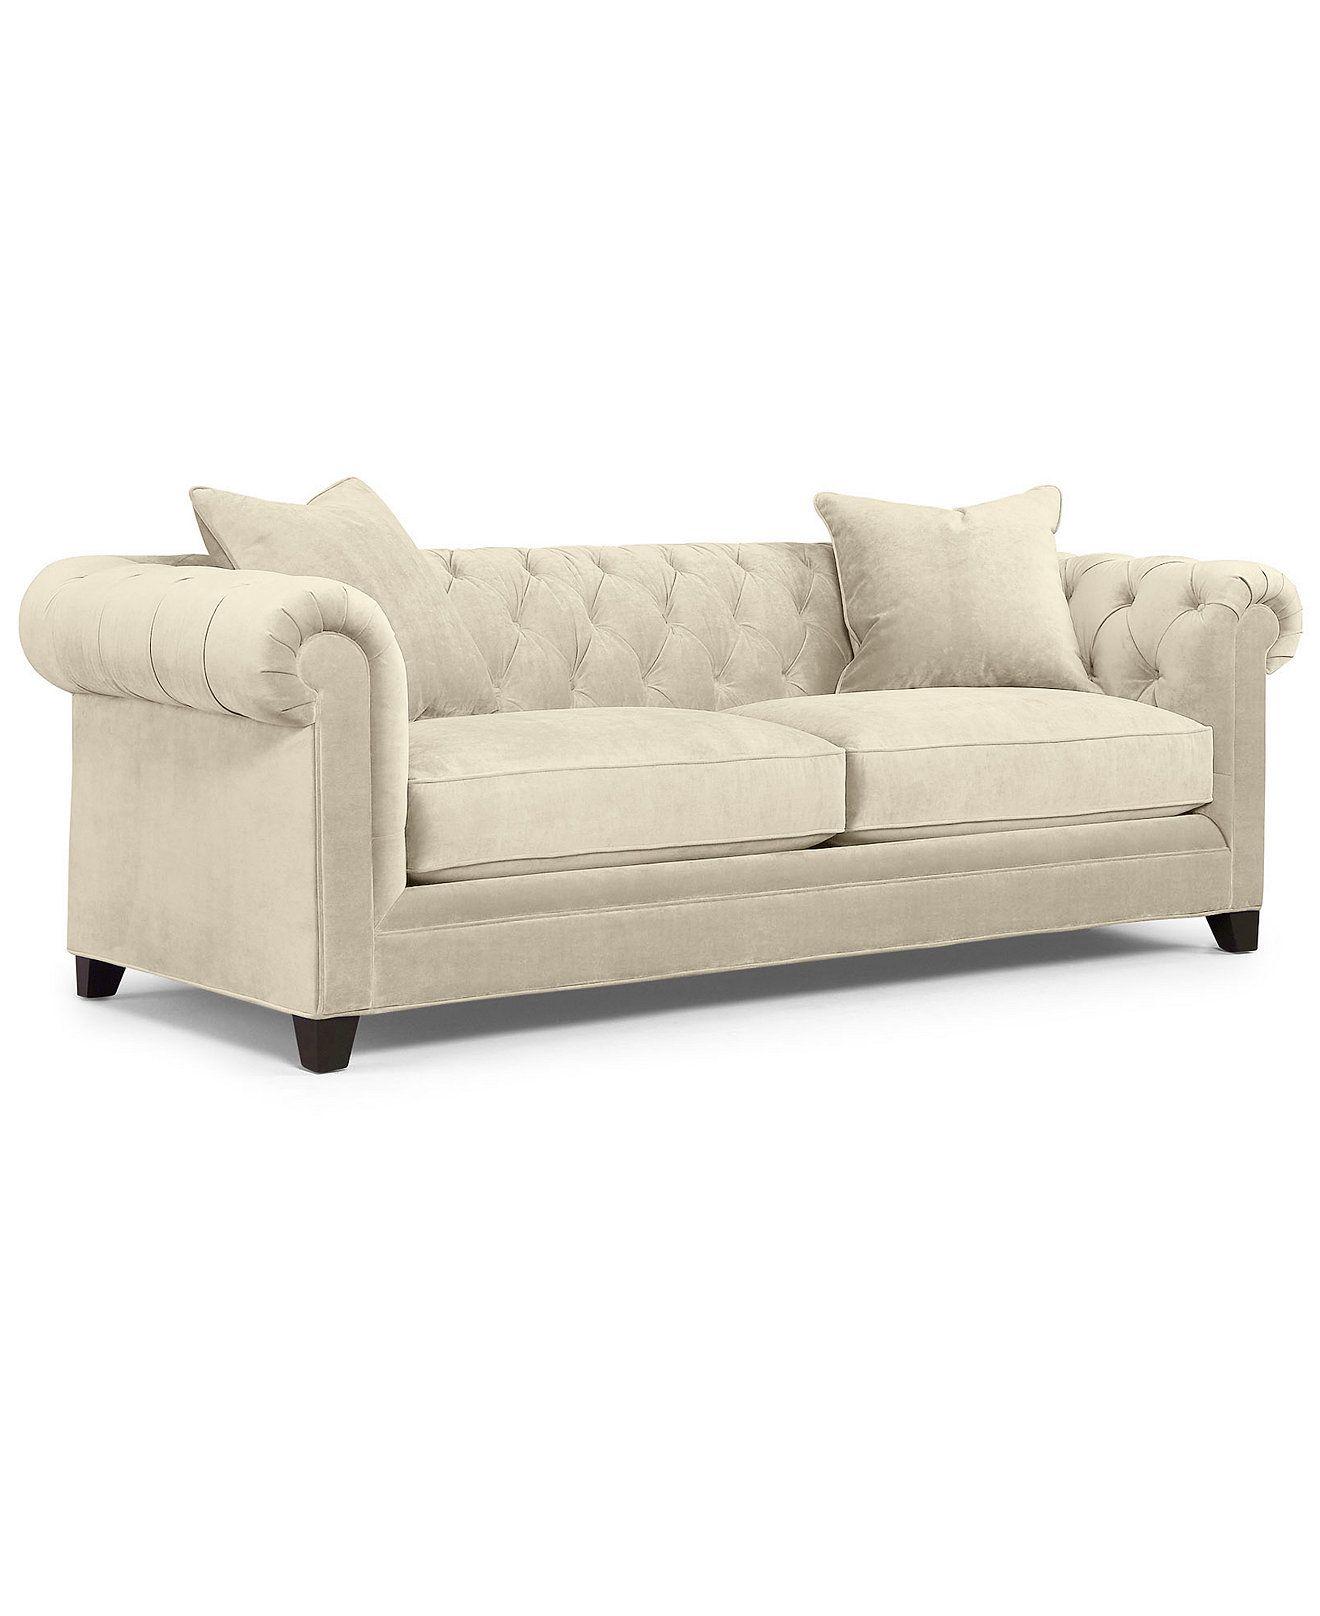 Macys Com Furniture: Saybridge 92 Fabric Sofa, Created For Macy's